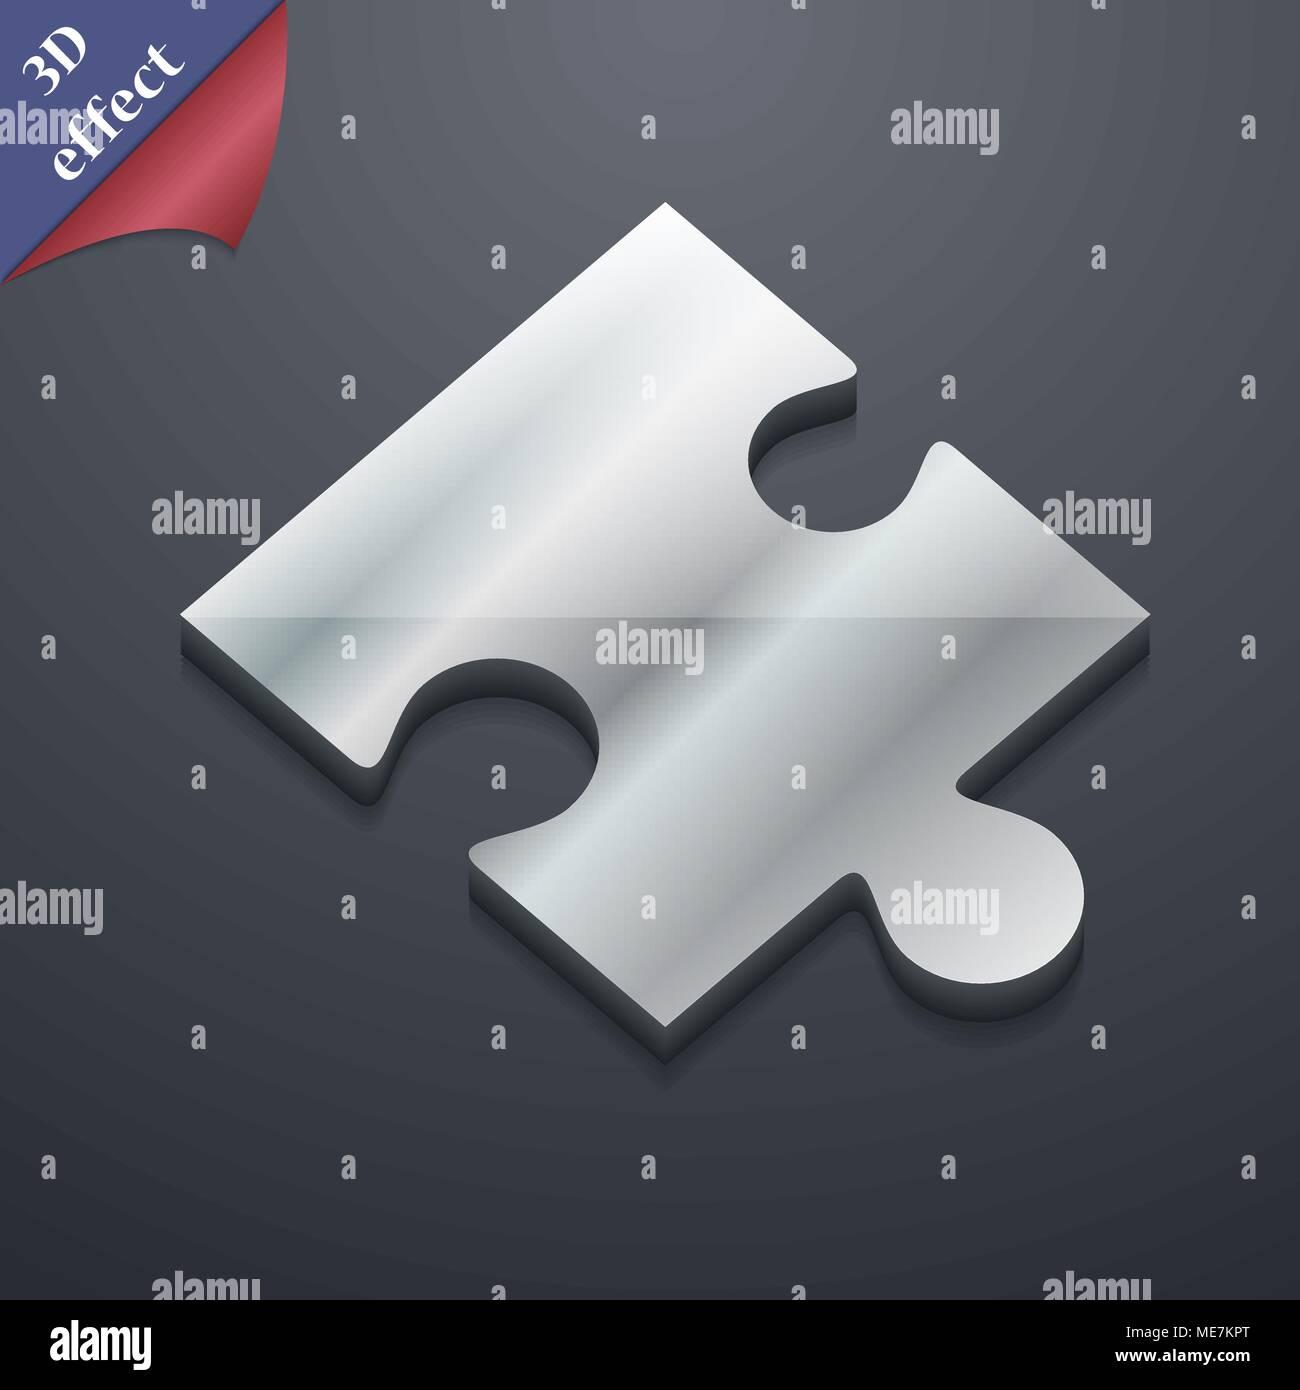 Puzzle piece icon symbol  3D style  Trendy, modern design